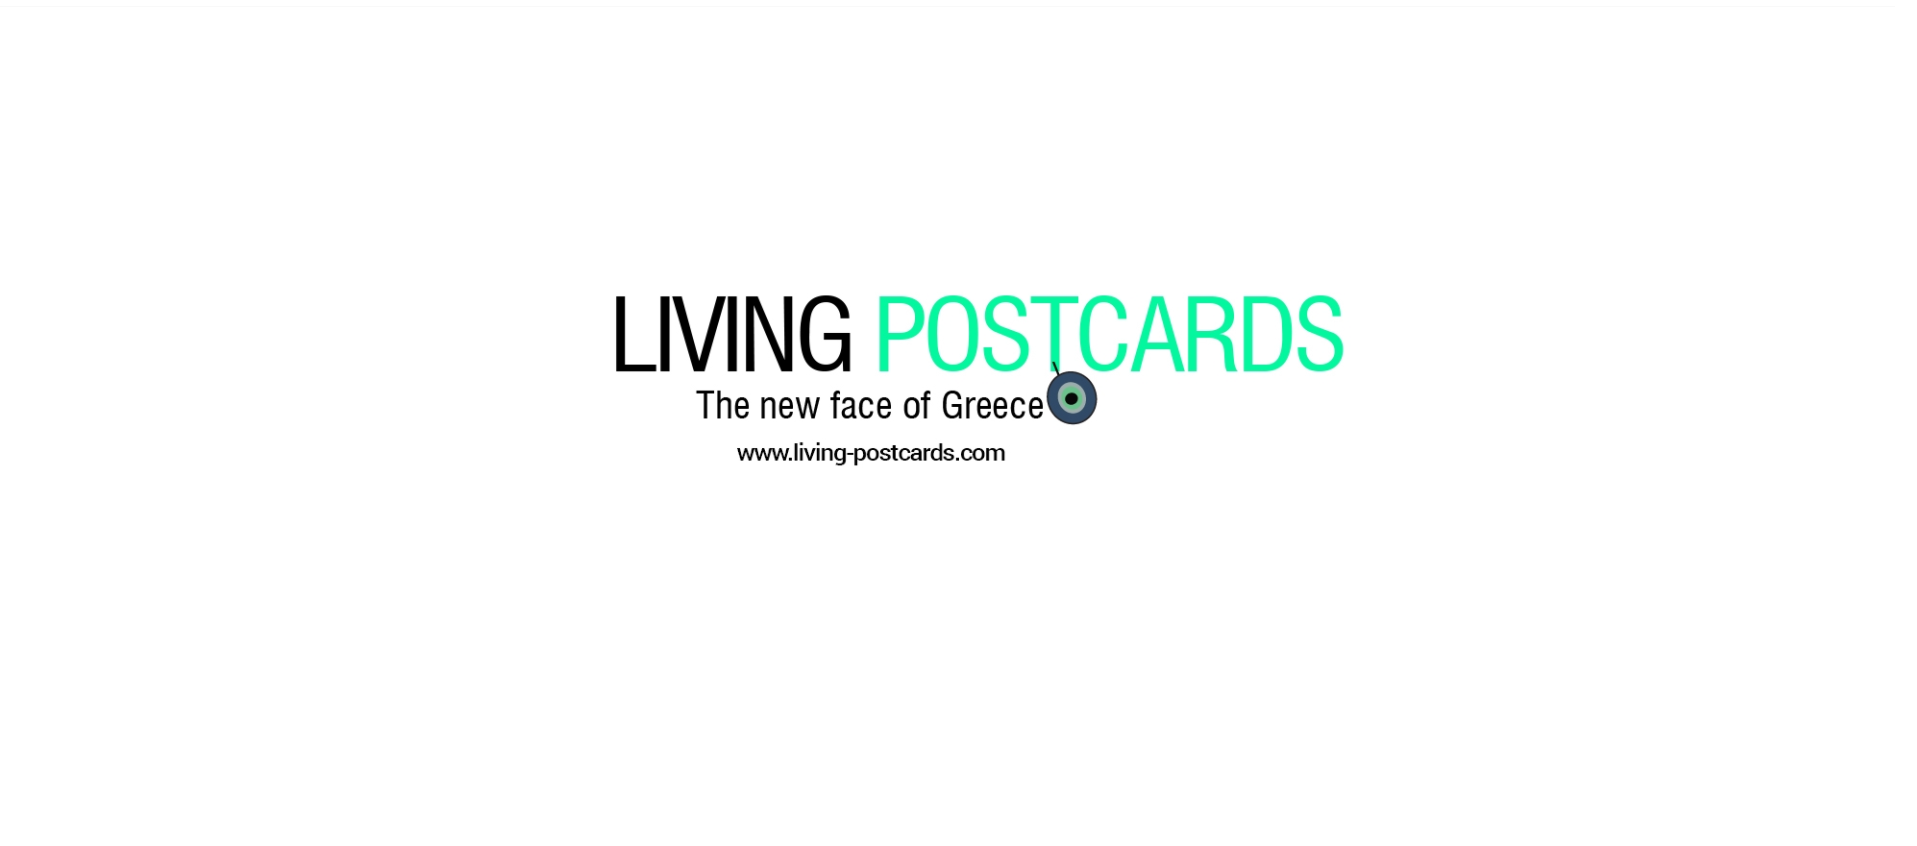 Living Postcards Success Story